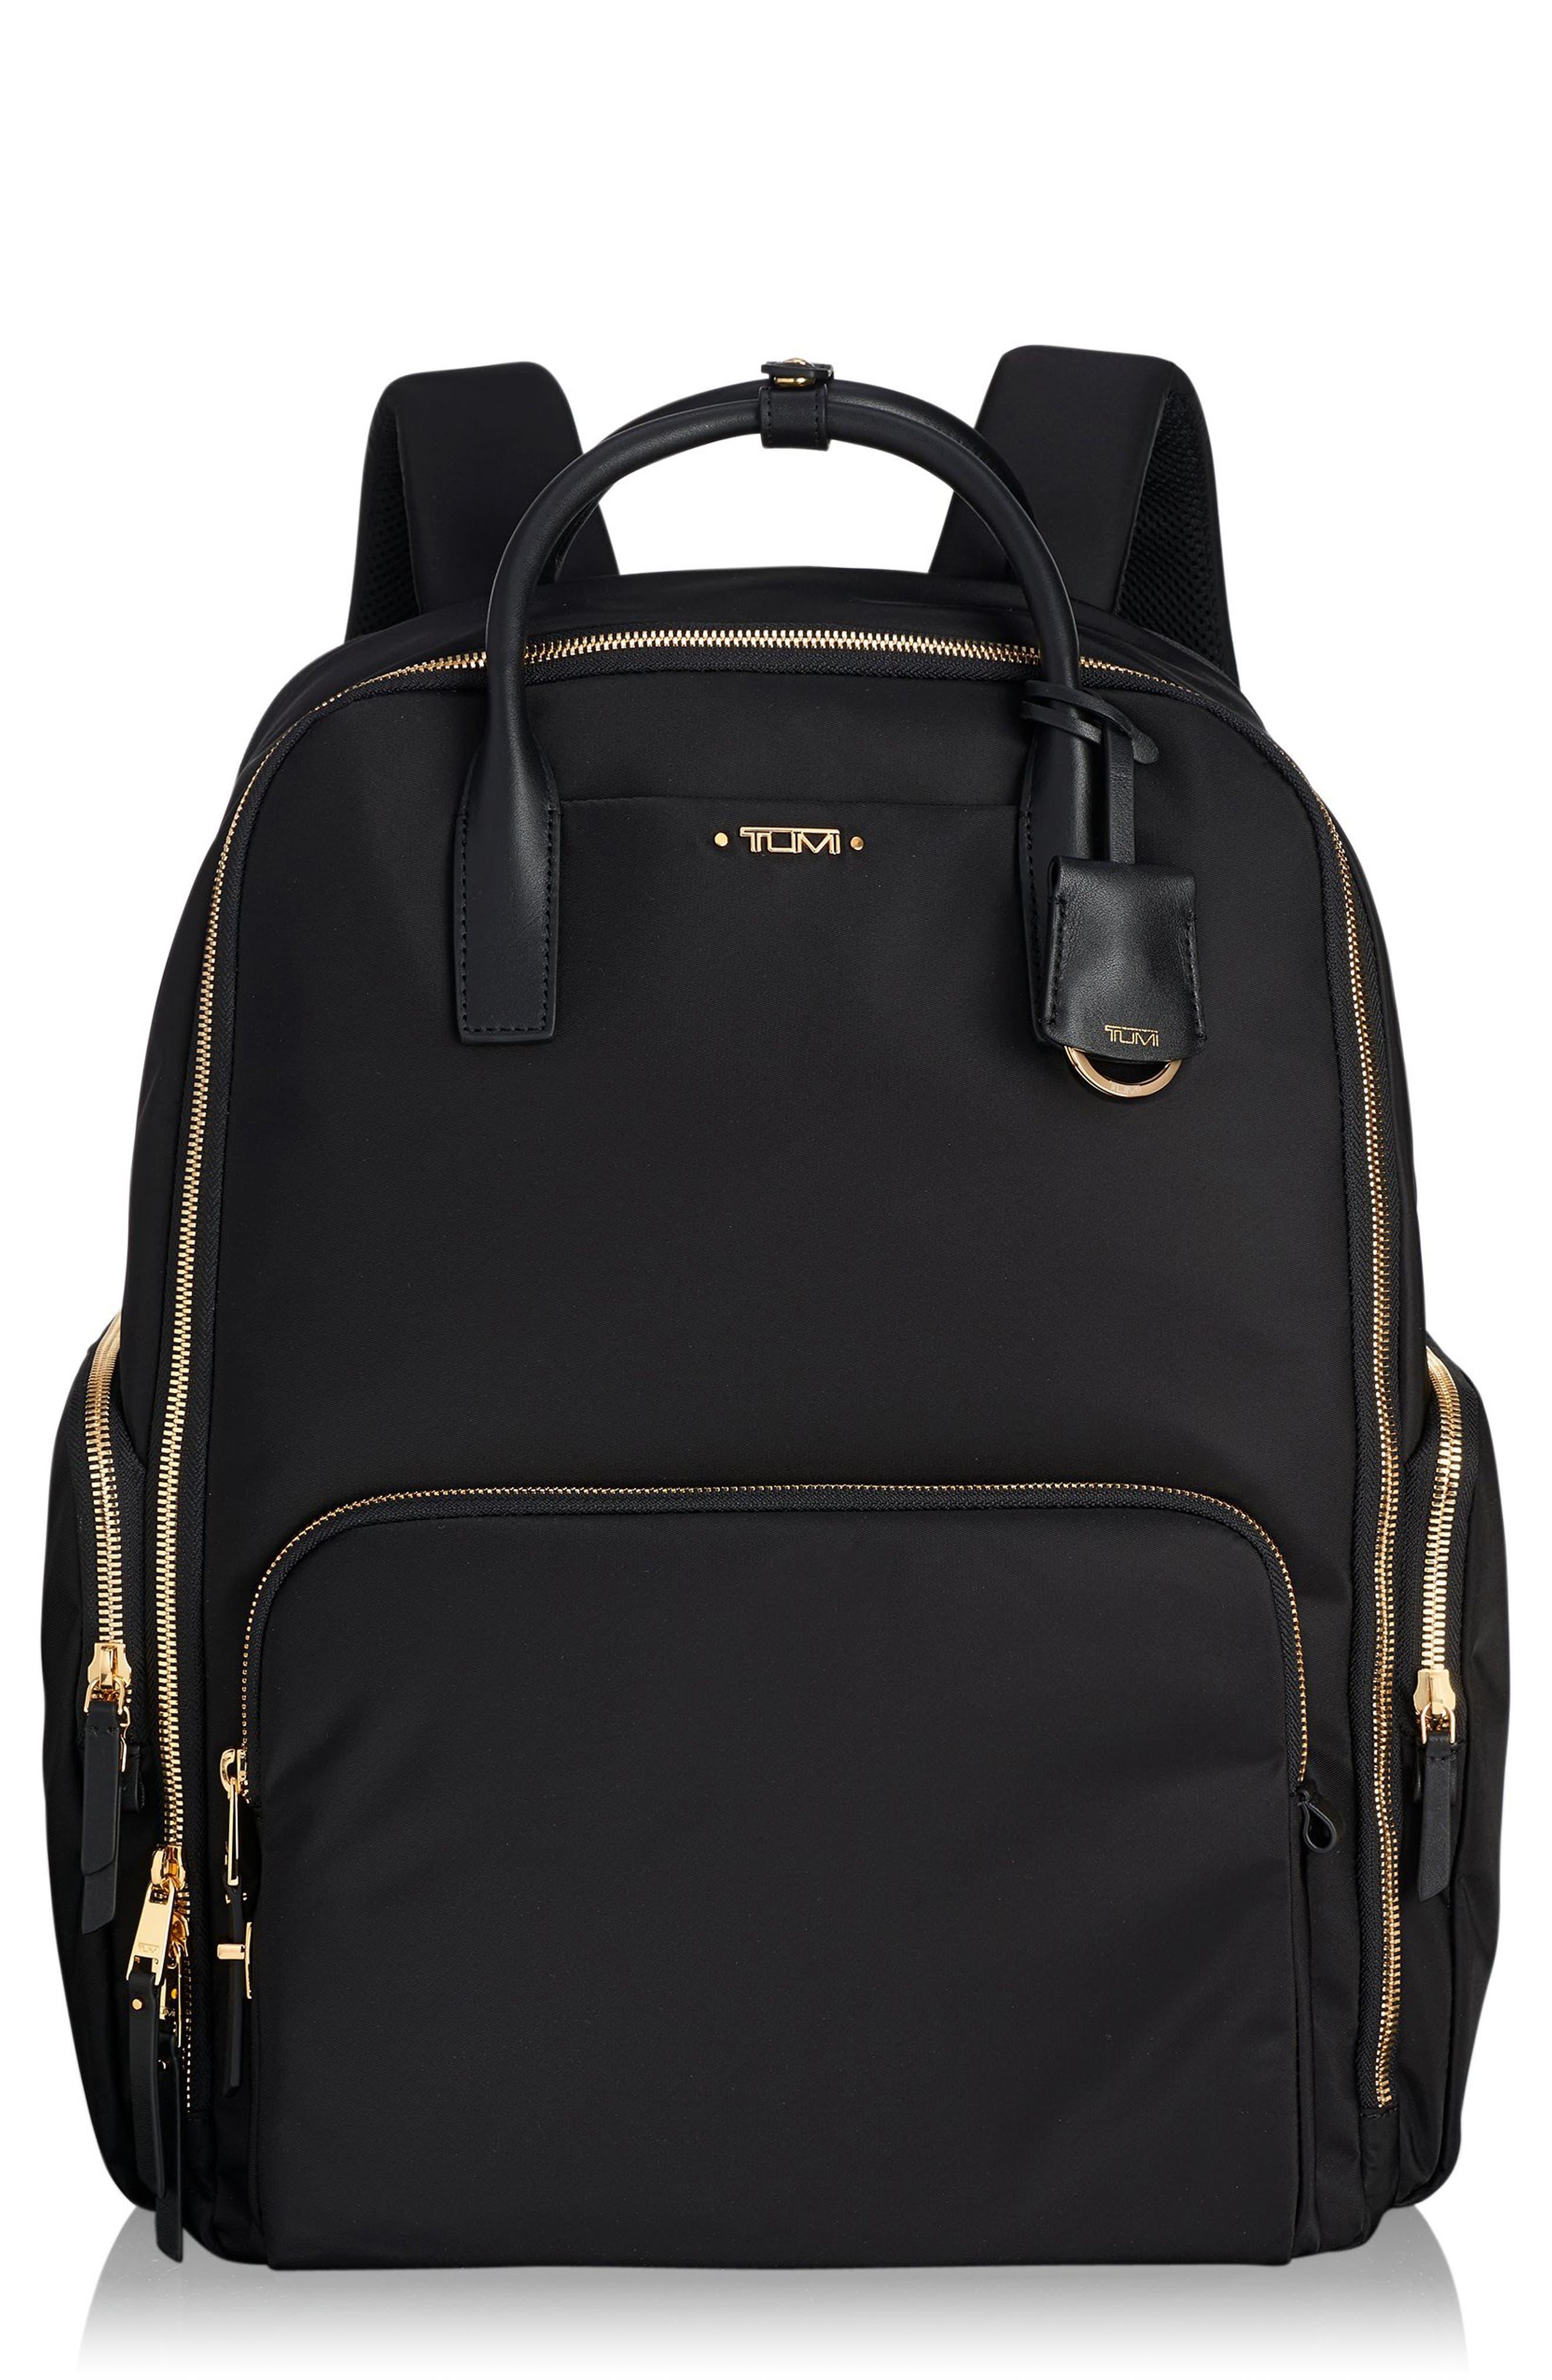 Voyager Ursula Nylon Backpack,                         Main,                         color, 001